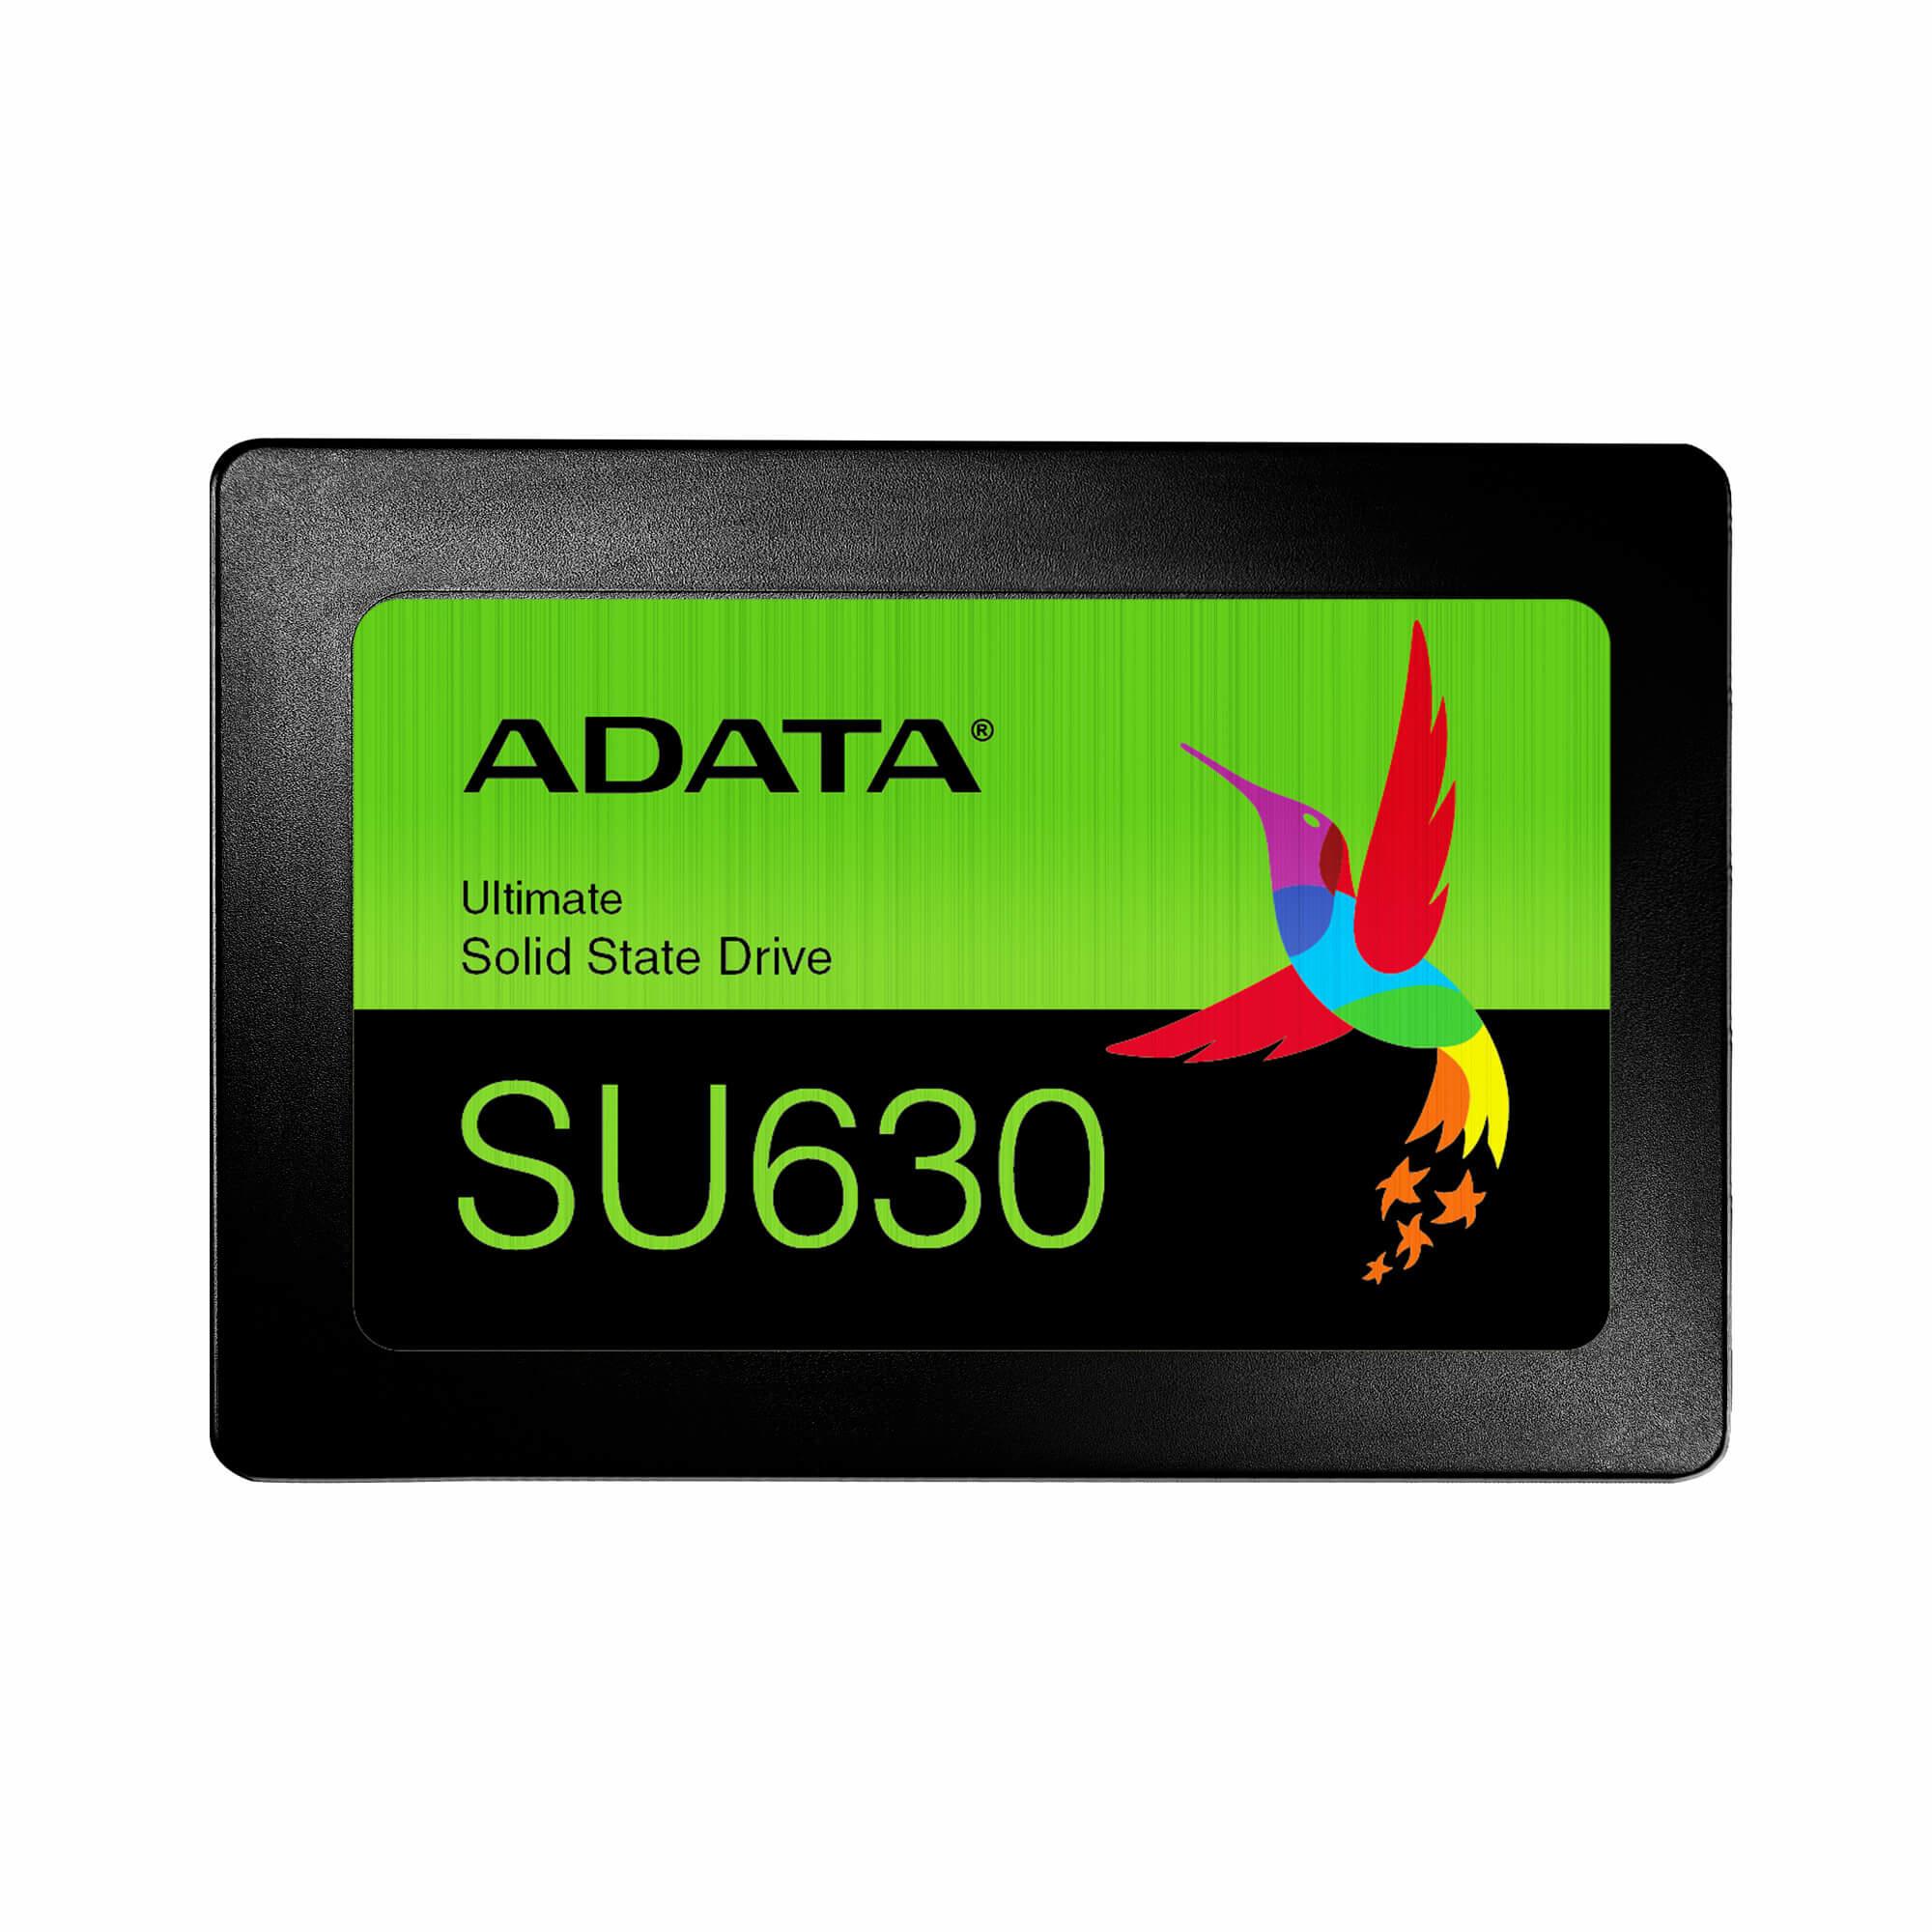 "Adata Ultimate SU630 2.5"" 1.9TB SATA III Solid State Drive, £157.64 at ILGS"